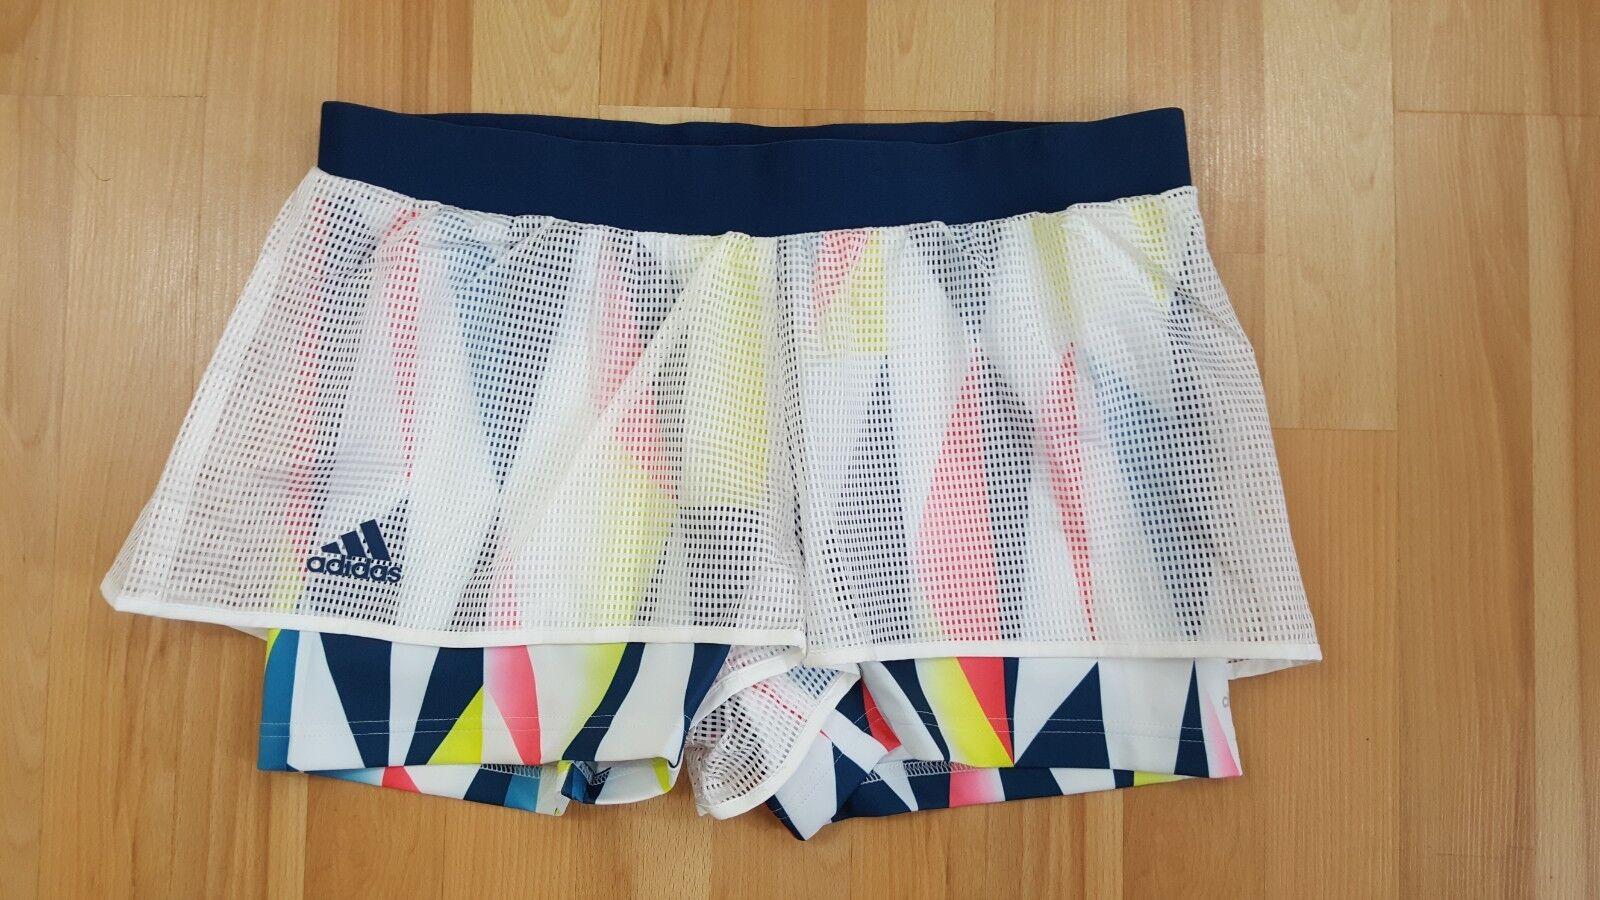 Adidas Women's  white   multi Pro tennis short Simona Halep NY collection